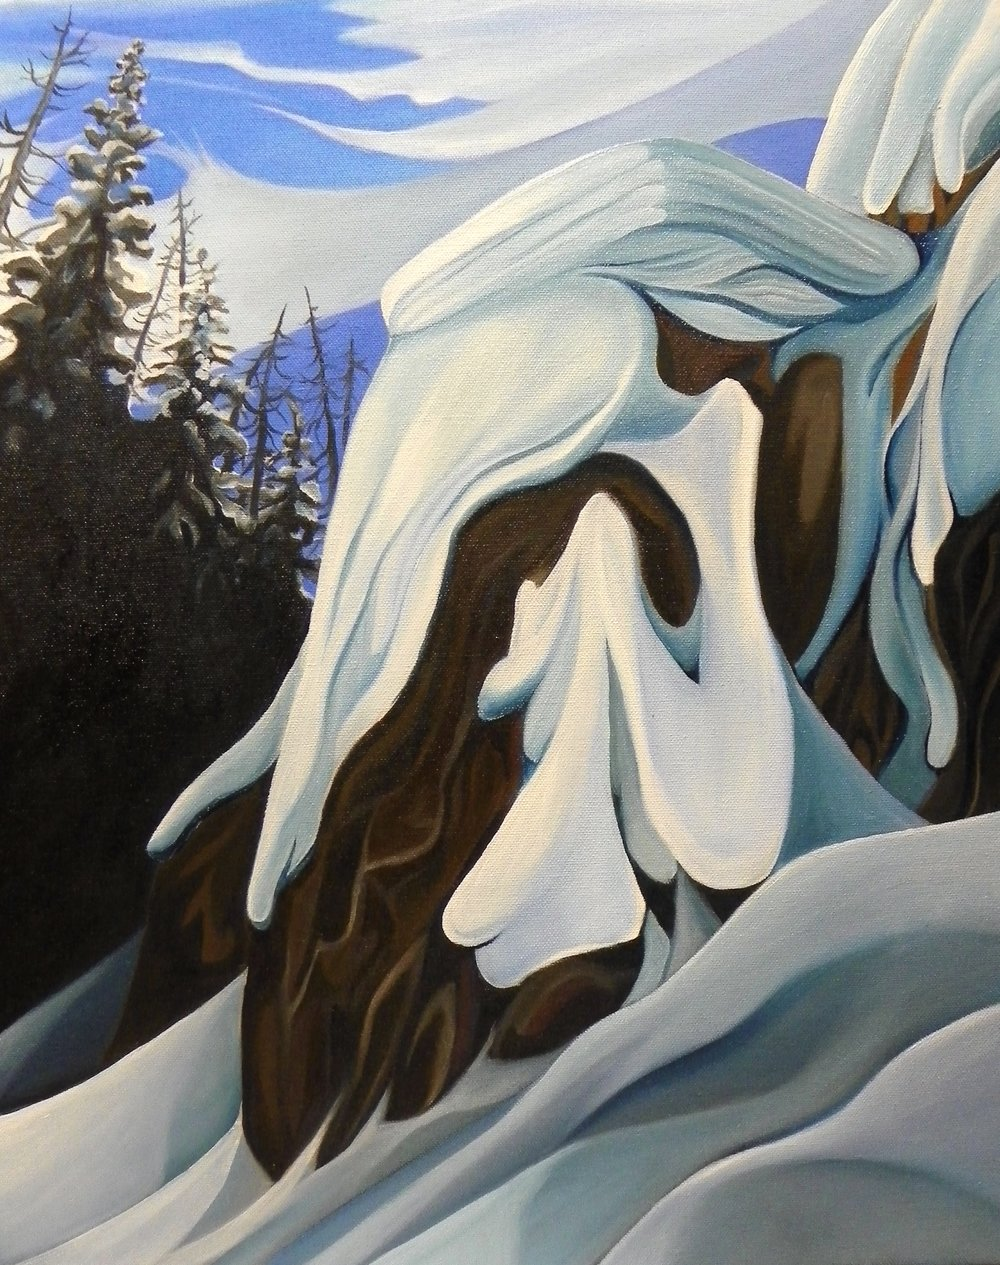 "Crystal Cliff -  Oil on canvas - 20"" x 16"" - 2014"